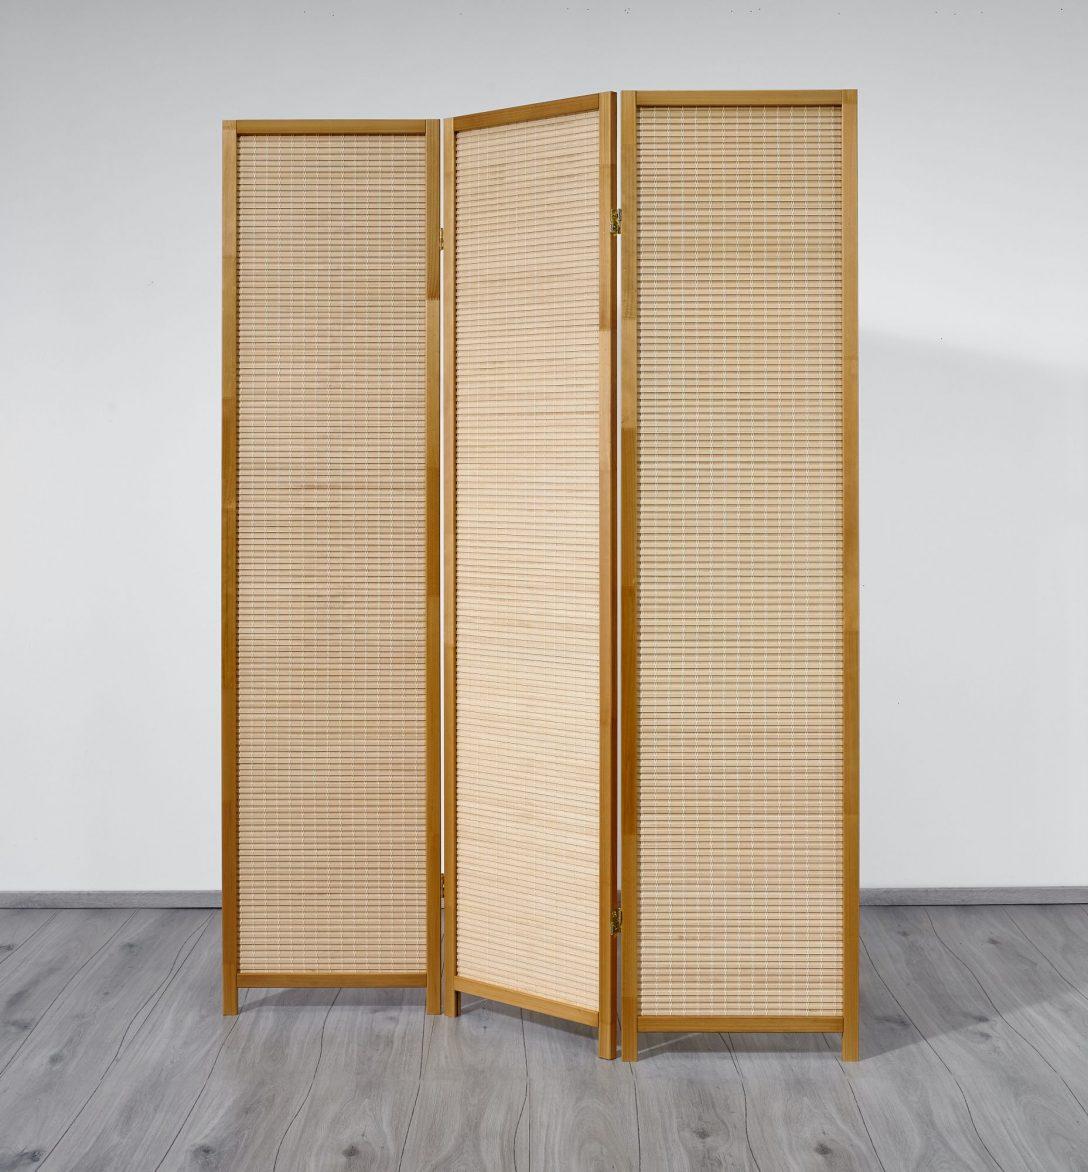 Full Size of Trennwand Ikea Paravent Garten Wetterfest Obi Hornbach Standfest Holz Toom Betten Bei 160x200 Küche Kosten Sofa Mit Schlaffunktion Glastrennwand Dusche Wohnzimmer Trennwand Ikea